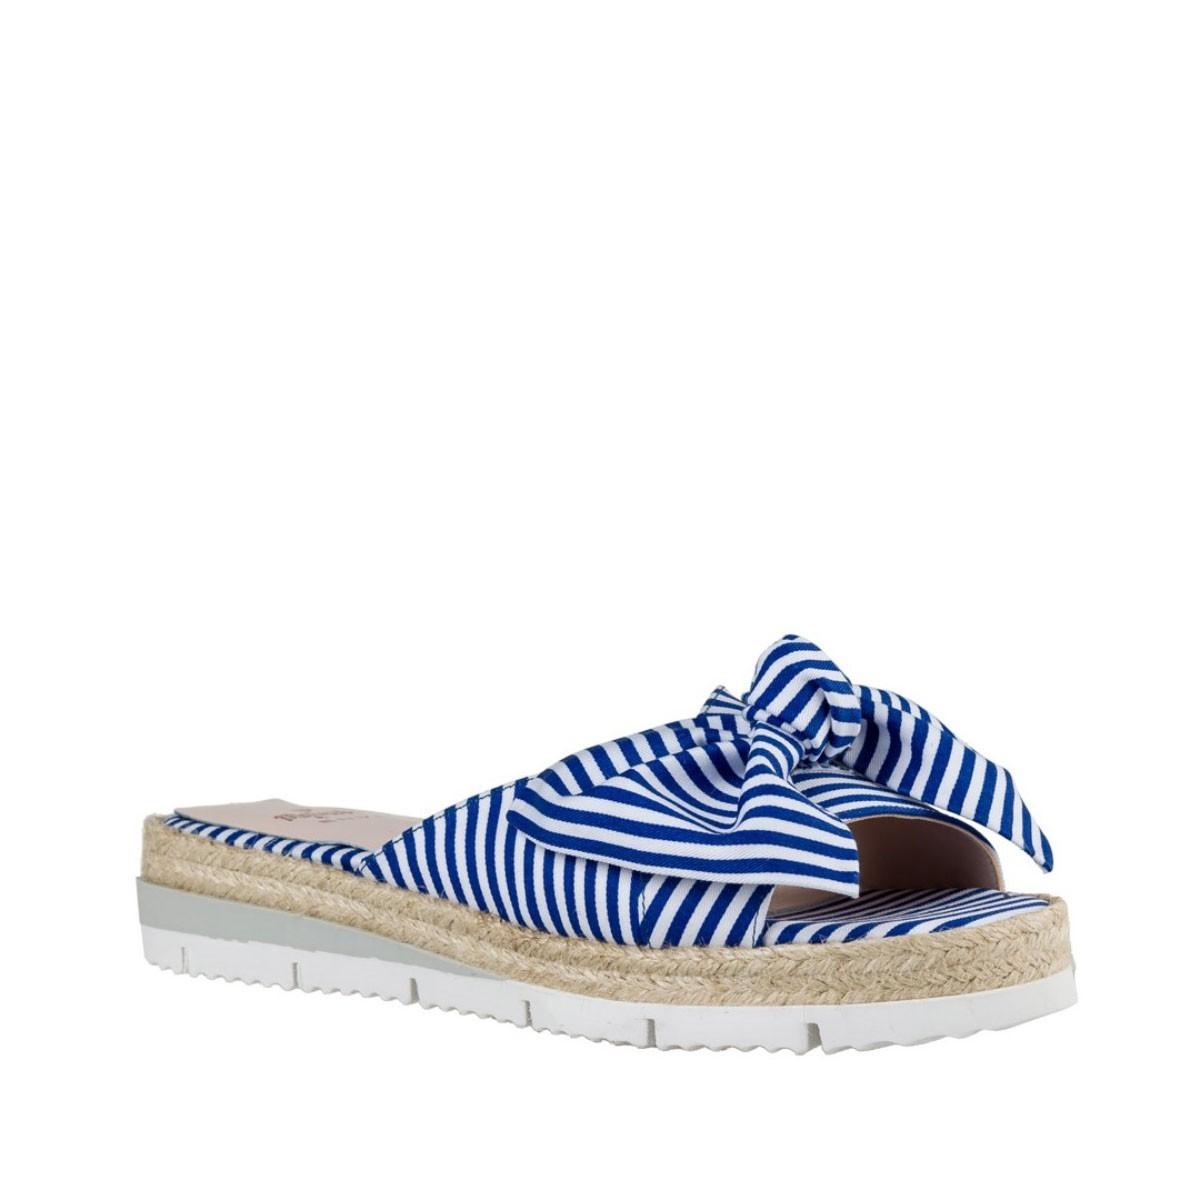 BagiotaShoes Mairiboo by Envie Shoes Γυναικείες Παντόφλες M03-05915 Μπλε  Ριγέ Mairiboo M03-05915 Μπλε 8fc70cd9672